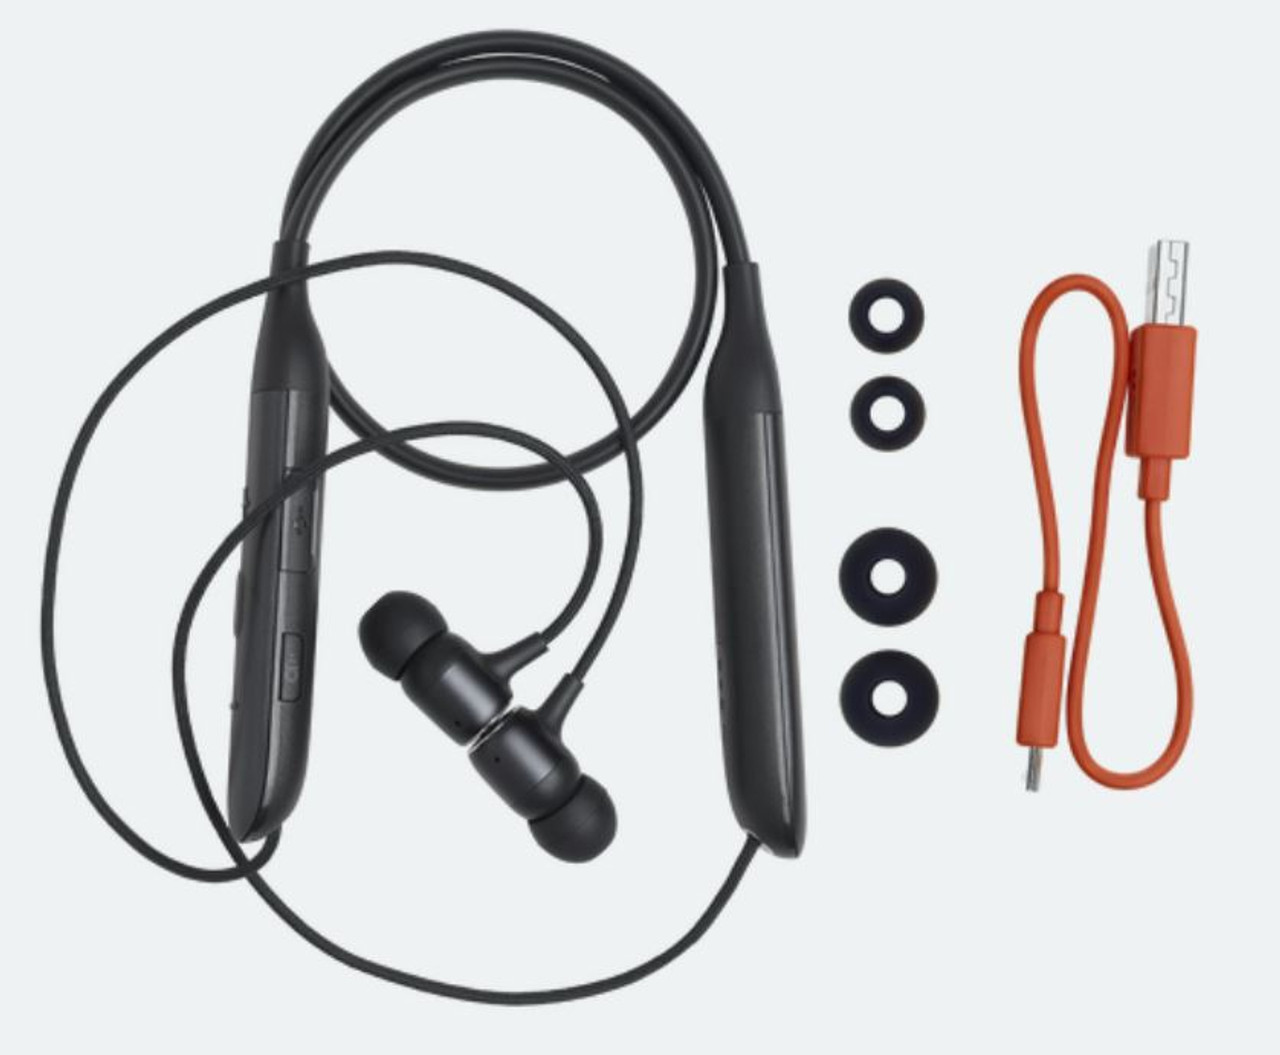 JBL Live 220BT Wireless in-ear Neckband Headphones Black-JBLLIVE220BTBKAM-Z - Certified Refurbished